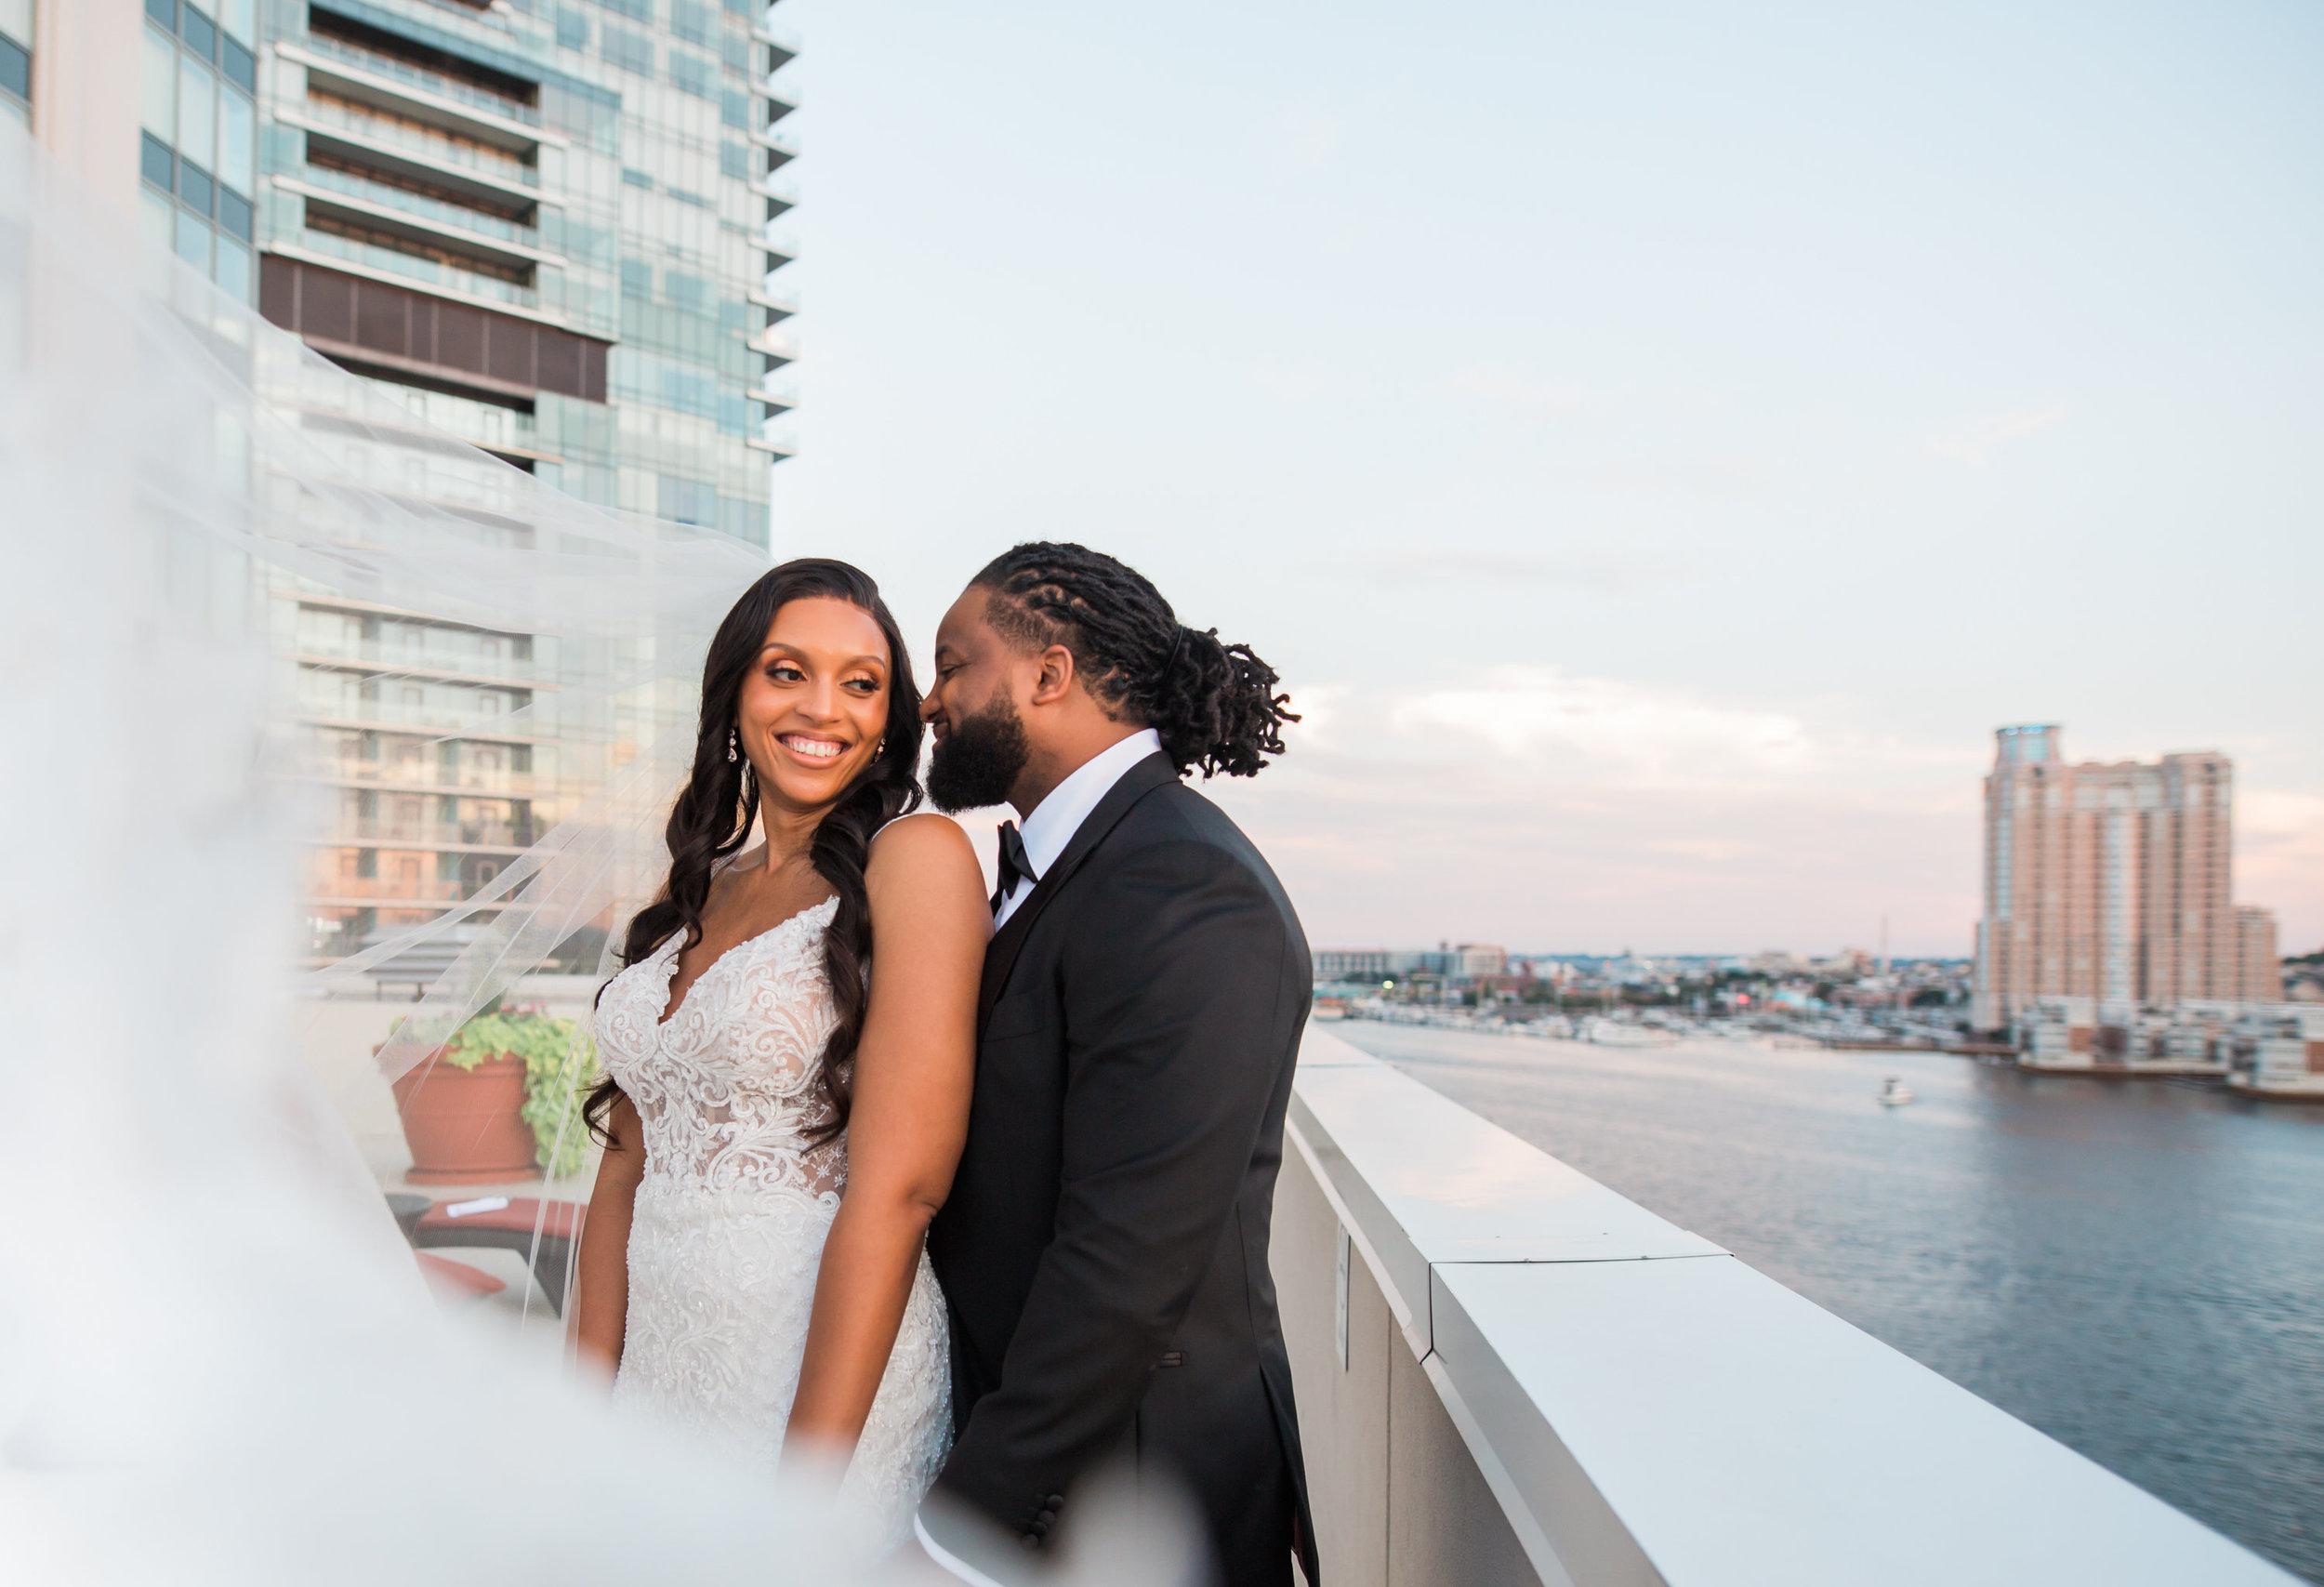 Black Bride Luxury Wedding Baltimore Marriott Waterfront Best Baltimore Photographers Megapixels Media PhotographyJasmine & Adrian Baltimore Bride MegapixelsMedia-107.jpg